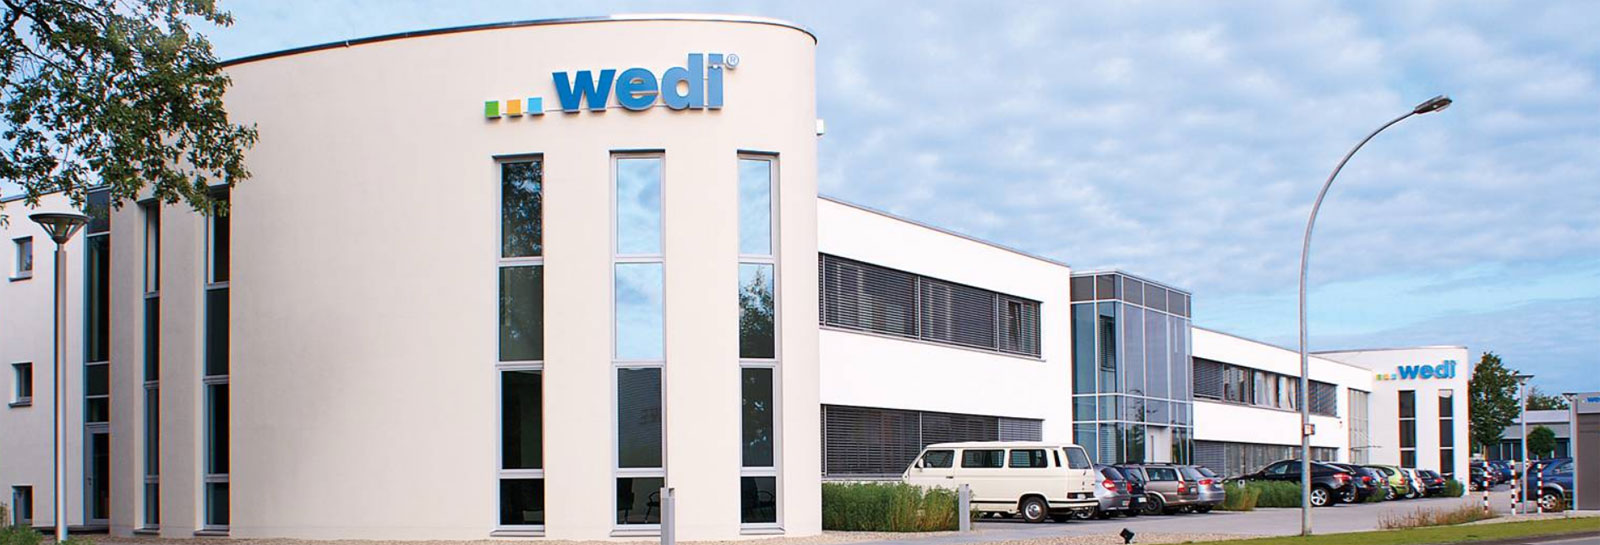 Wedi.com saved in UDRP against WEDI GmbH, Germany